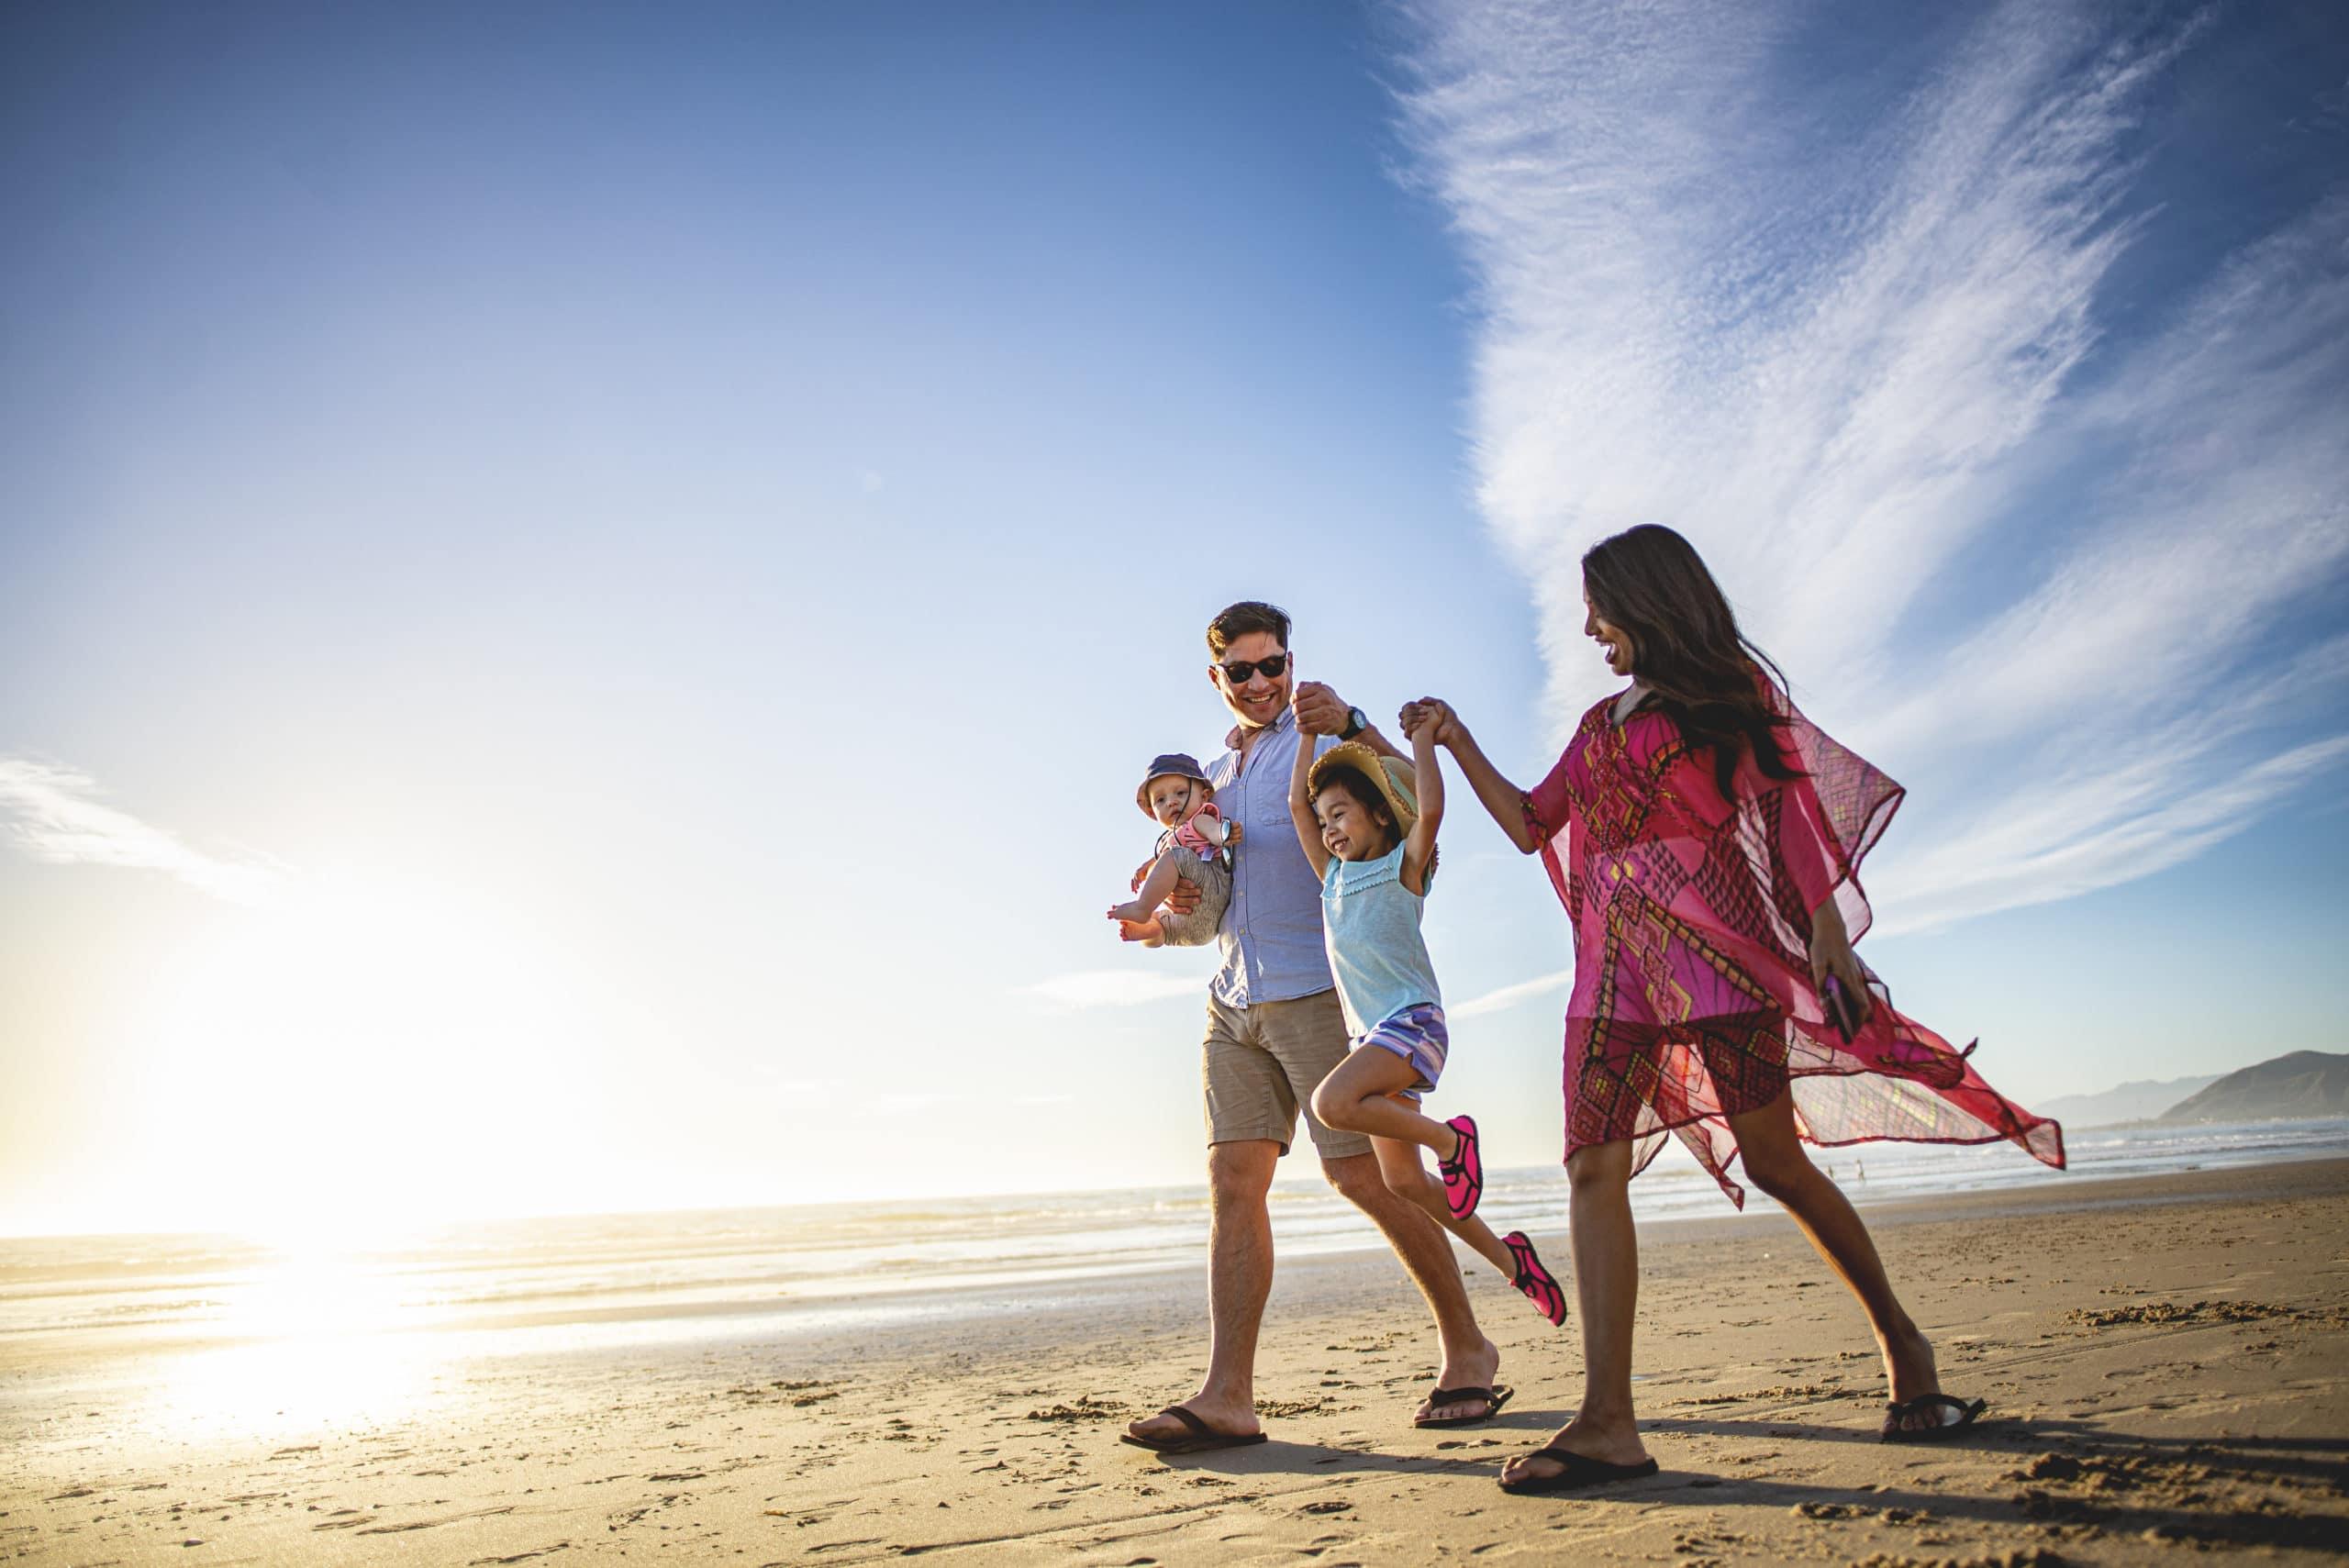 Ventura_Beach_Family Time_Landscape (10)